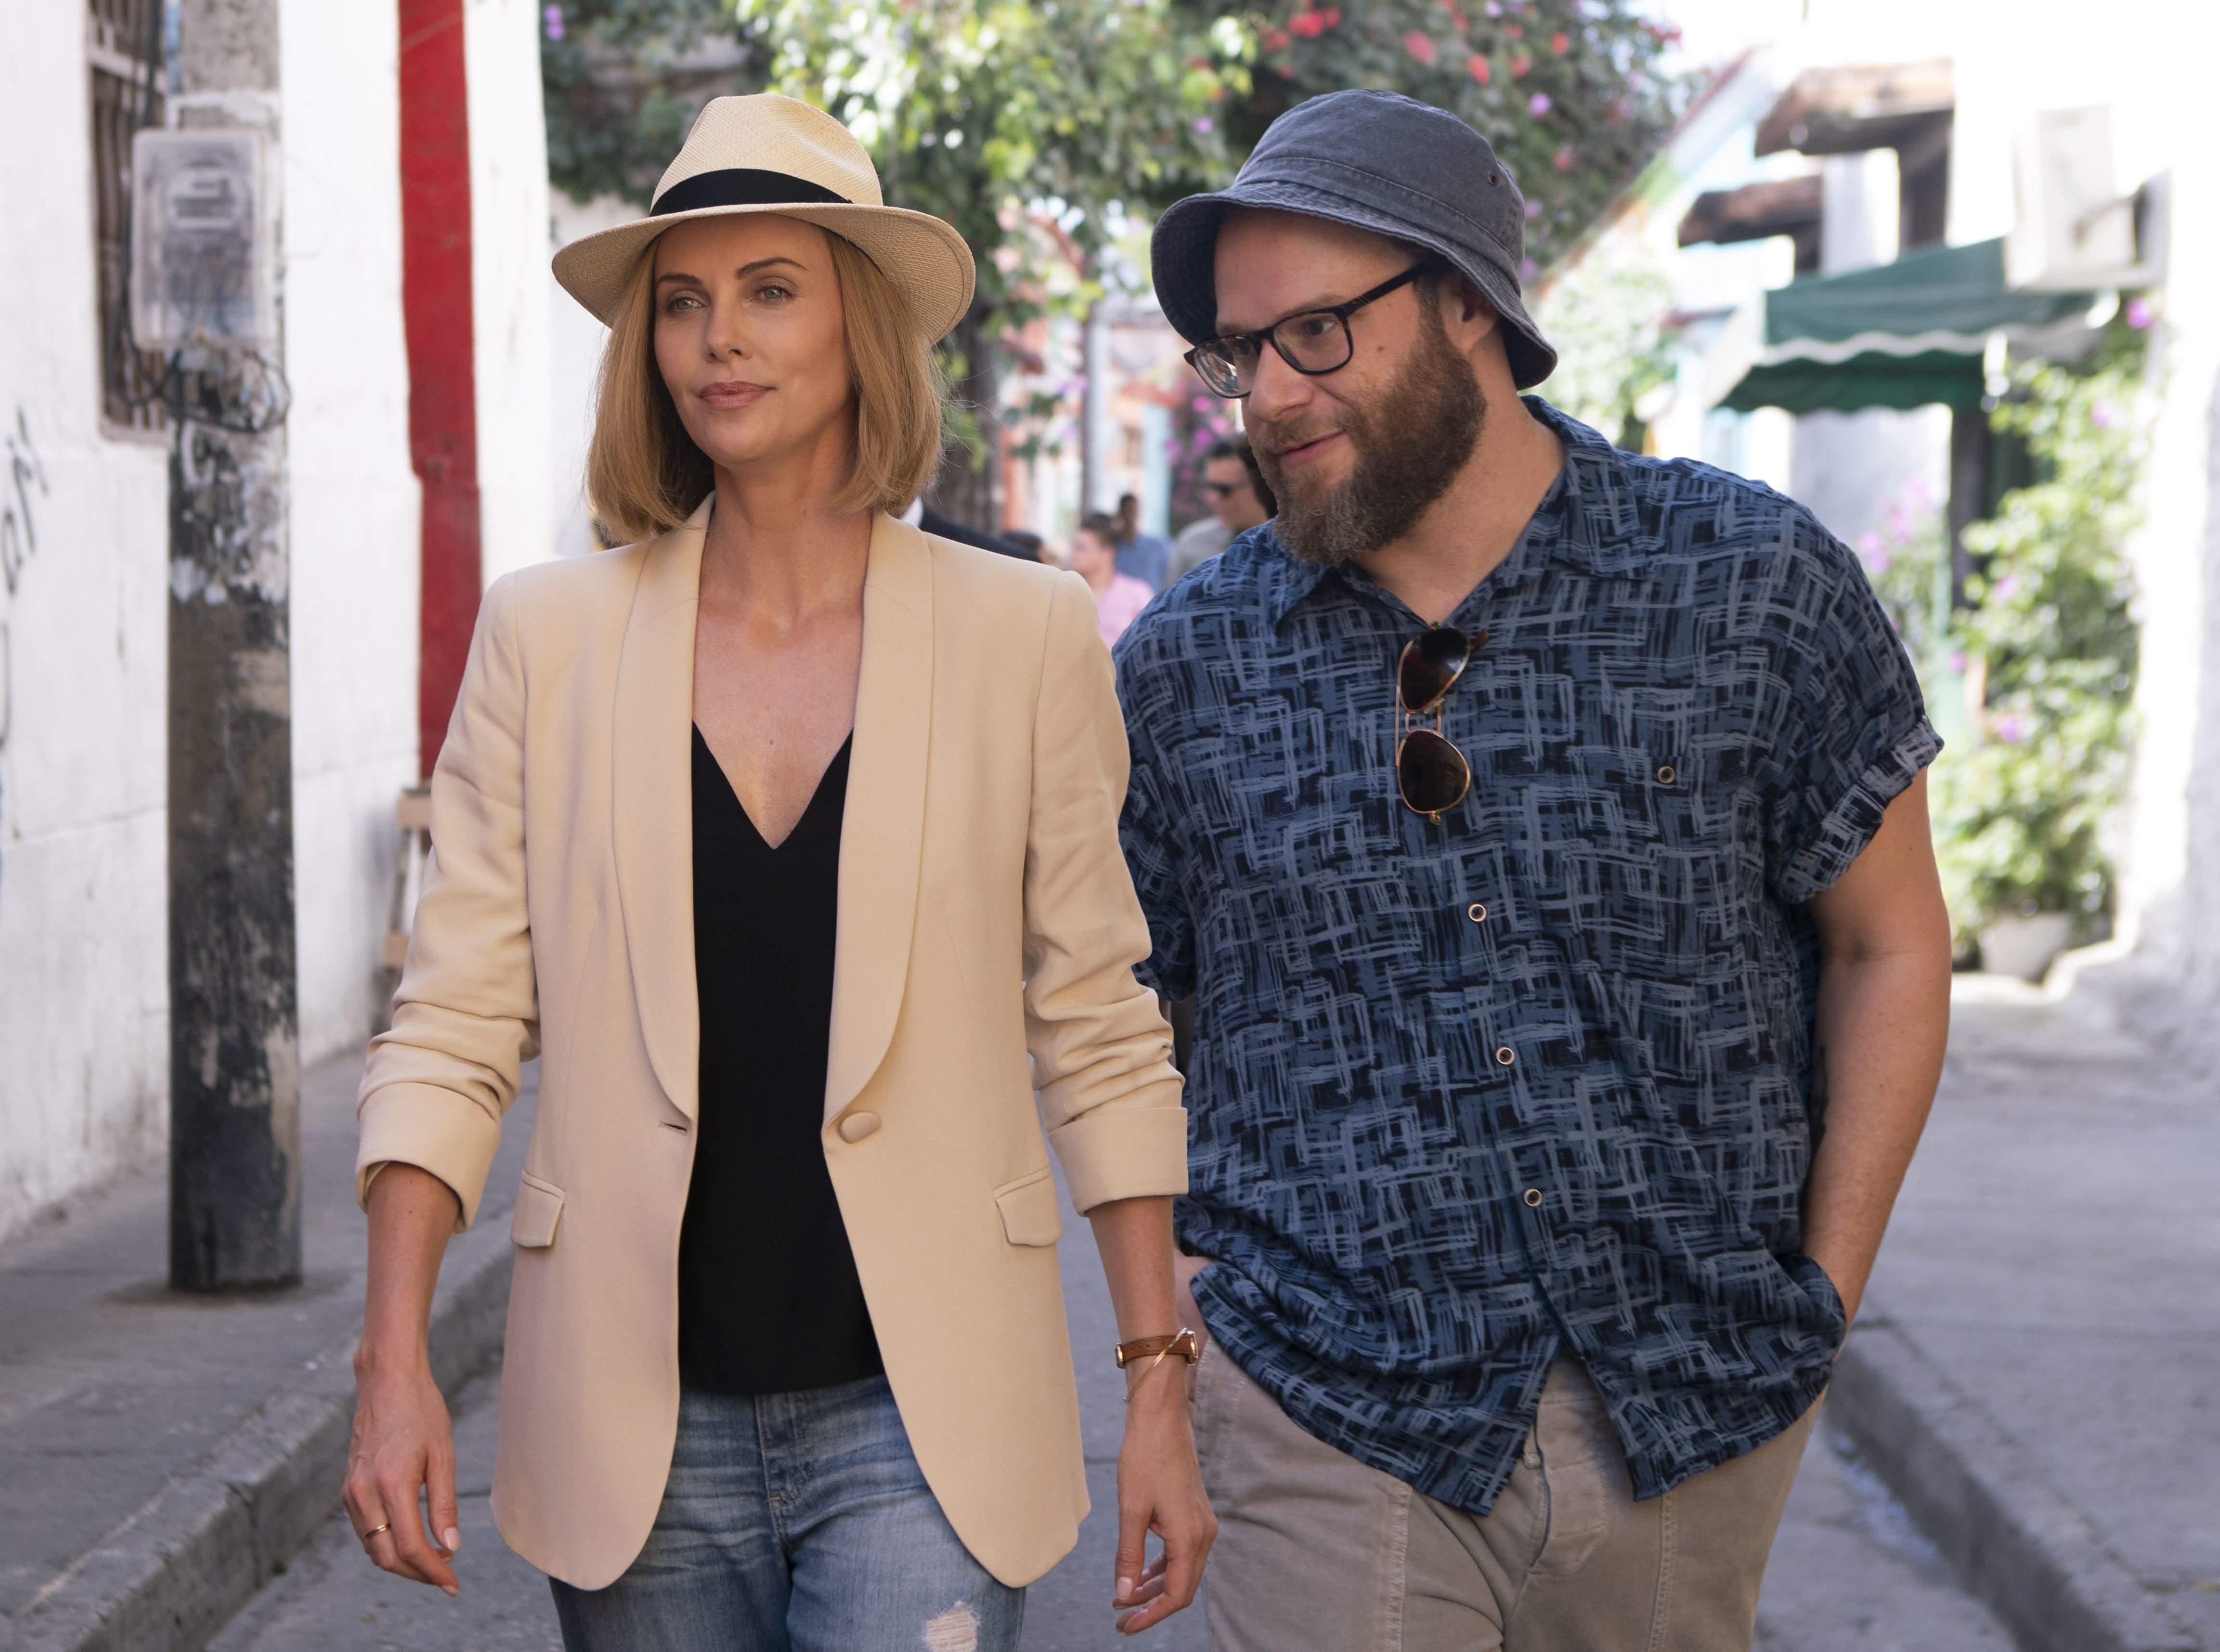 Box Office : 5月3日~5日の全米映画ボックスオフィスTOP5 - シャーリーズ・セロンが演じる大統領候補の政治家と、セス・ローゲンの世渡りベタのジャーナリストのミスマッチな恋を描いた大人の女性向けロマコメ「ロング・ショット」が、「アベンジャーズ」を相手に健闘するも、高評に見合わぬ期待ハズレの初登場第3位 ! !